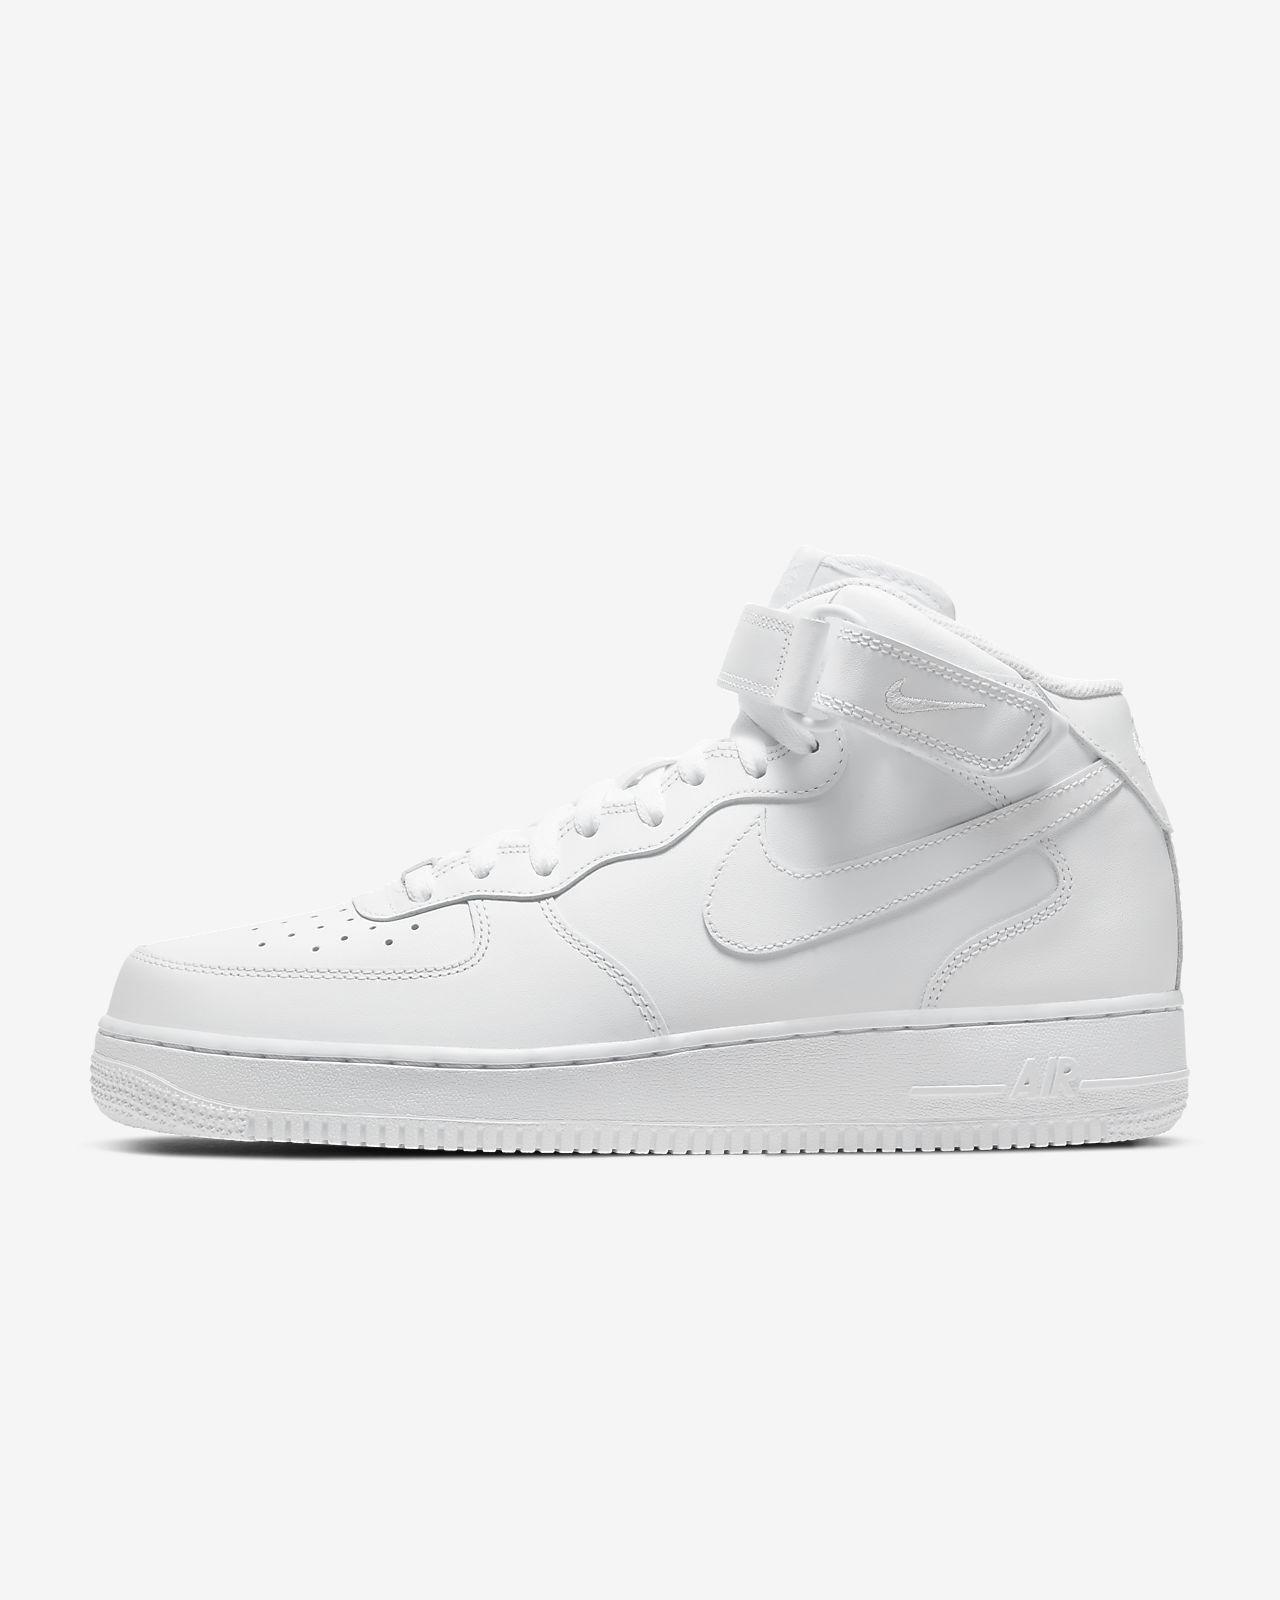 Nike Air Force 1 Mid '07 男子运动鞋